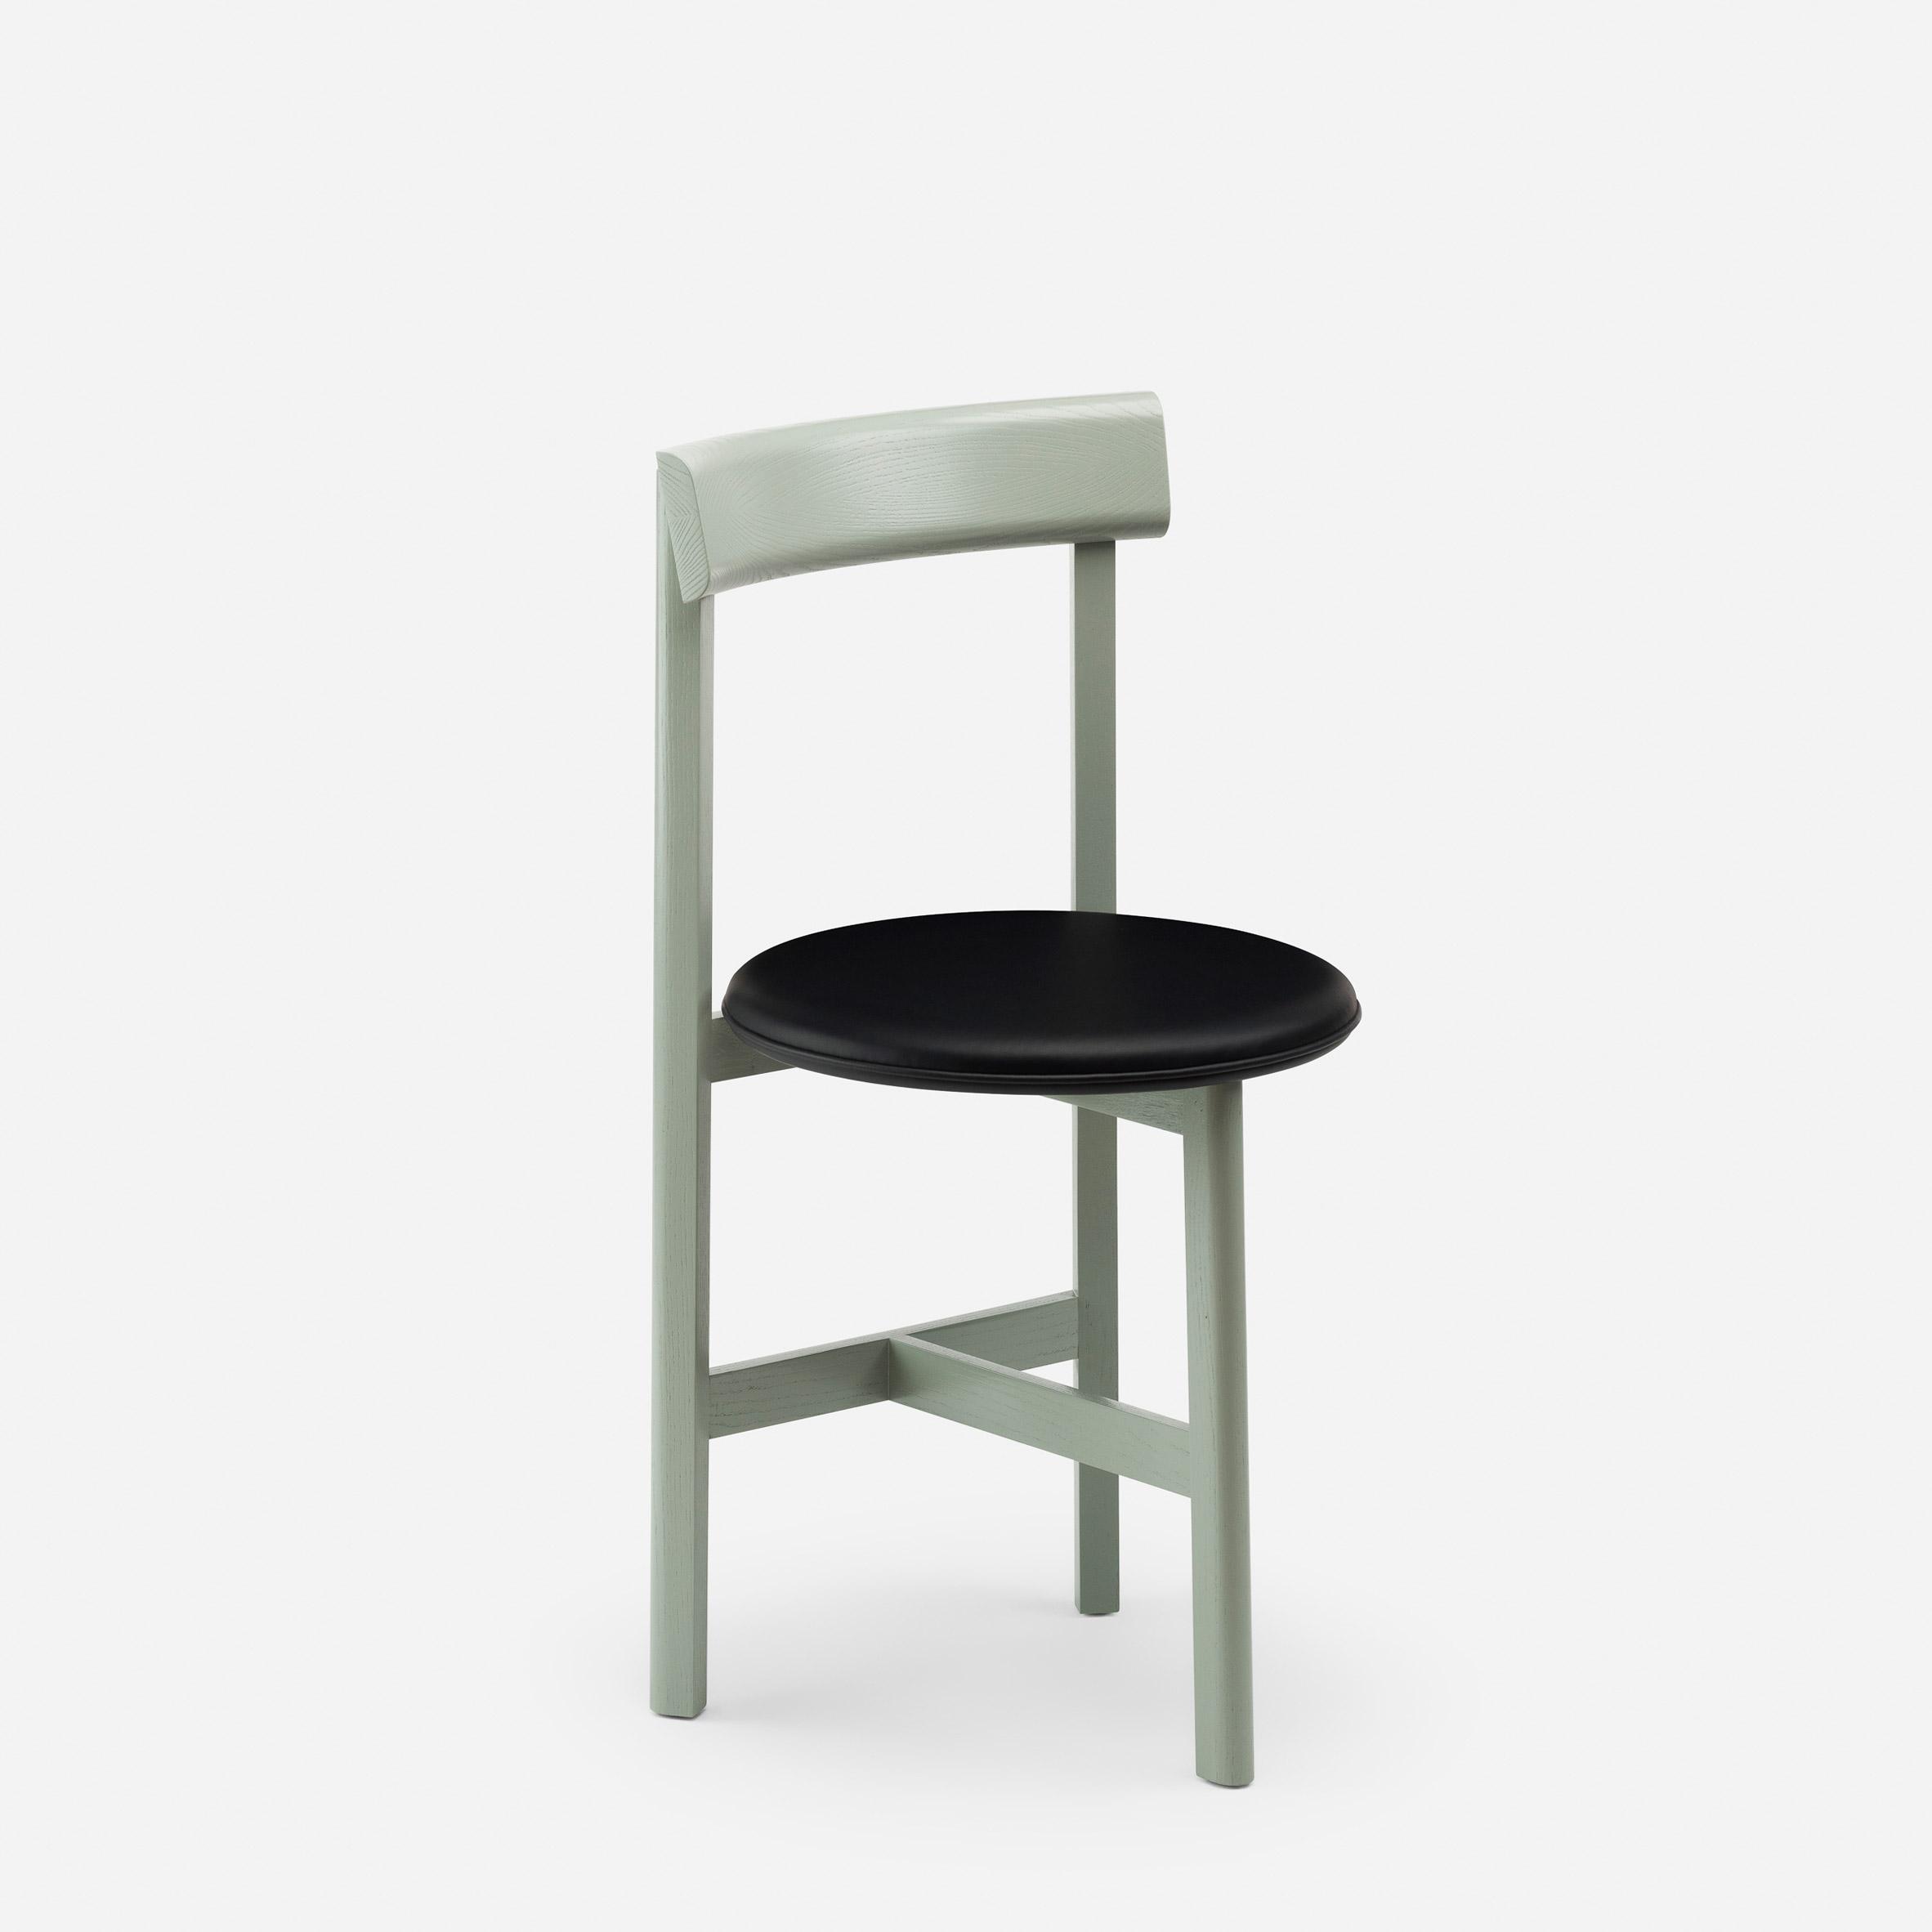 De La Espada launches Petit dining chair by Neri&Hu